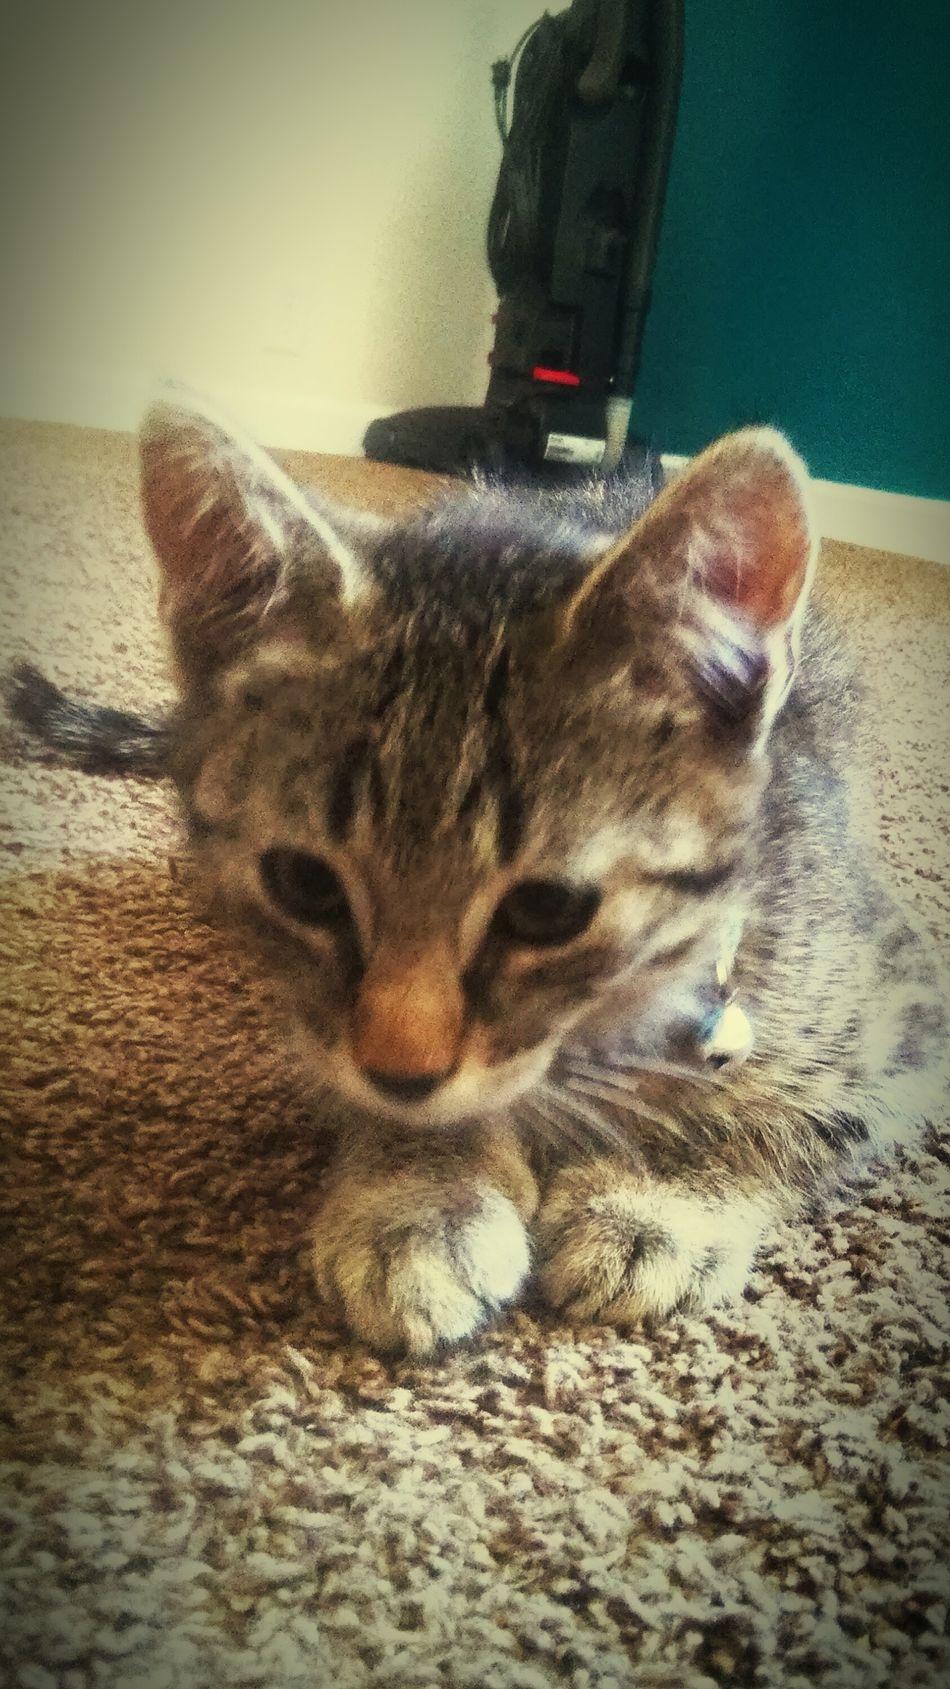 Kitty Kitten 🐱 Love ♥ Kitty Cats  Kitty Cuddles Adorable Cat  Cuteeee♥♡♥ Baby Boy TabbyCat Strongmarkings Mouser Gotchacatchmice My Baby Boy Mr.meowgi